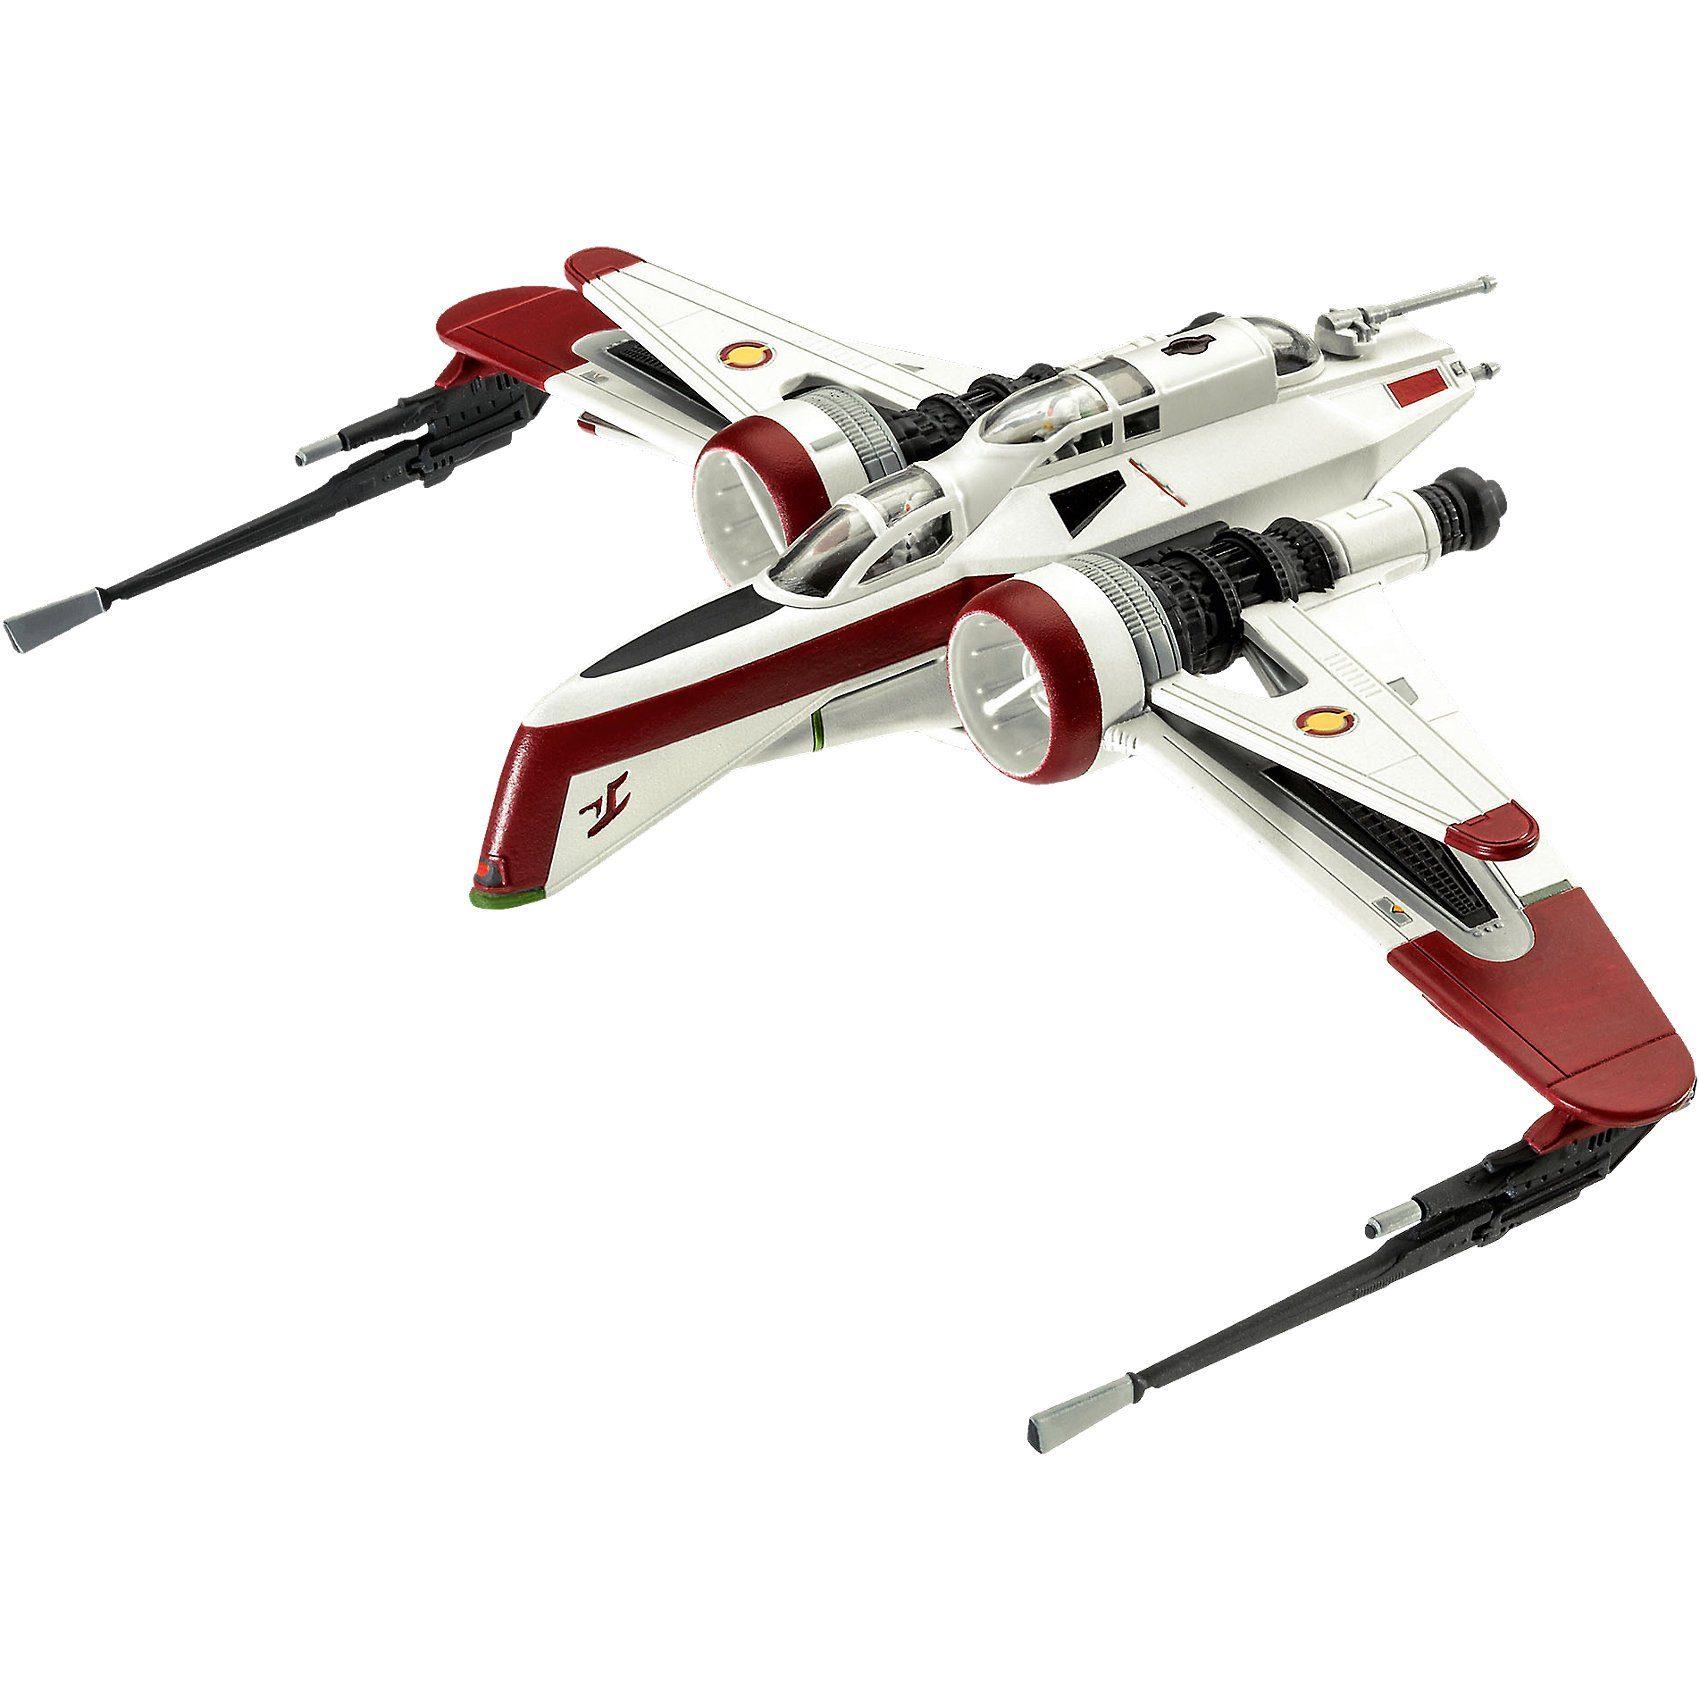 Revell® Modellbausatz Star Wars ARC-170 Fighter